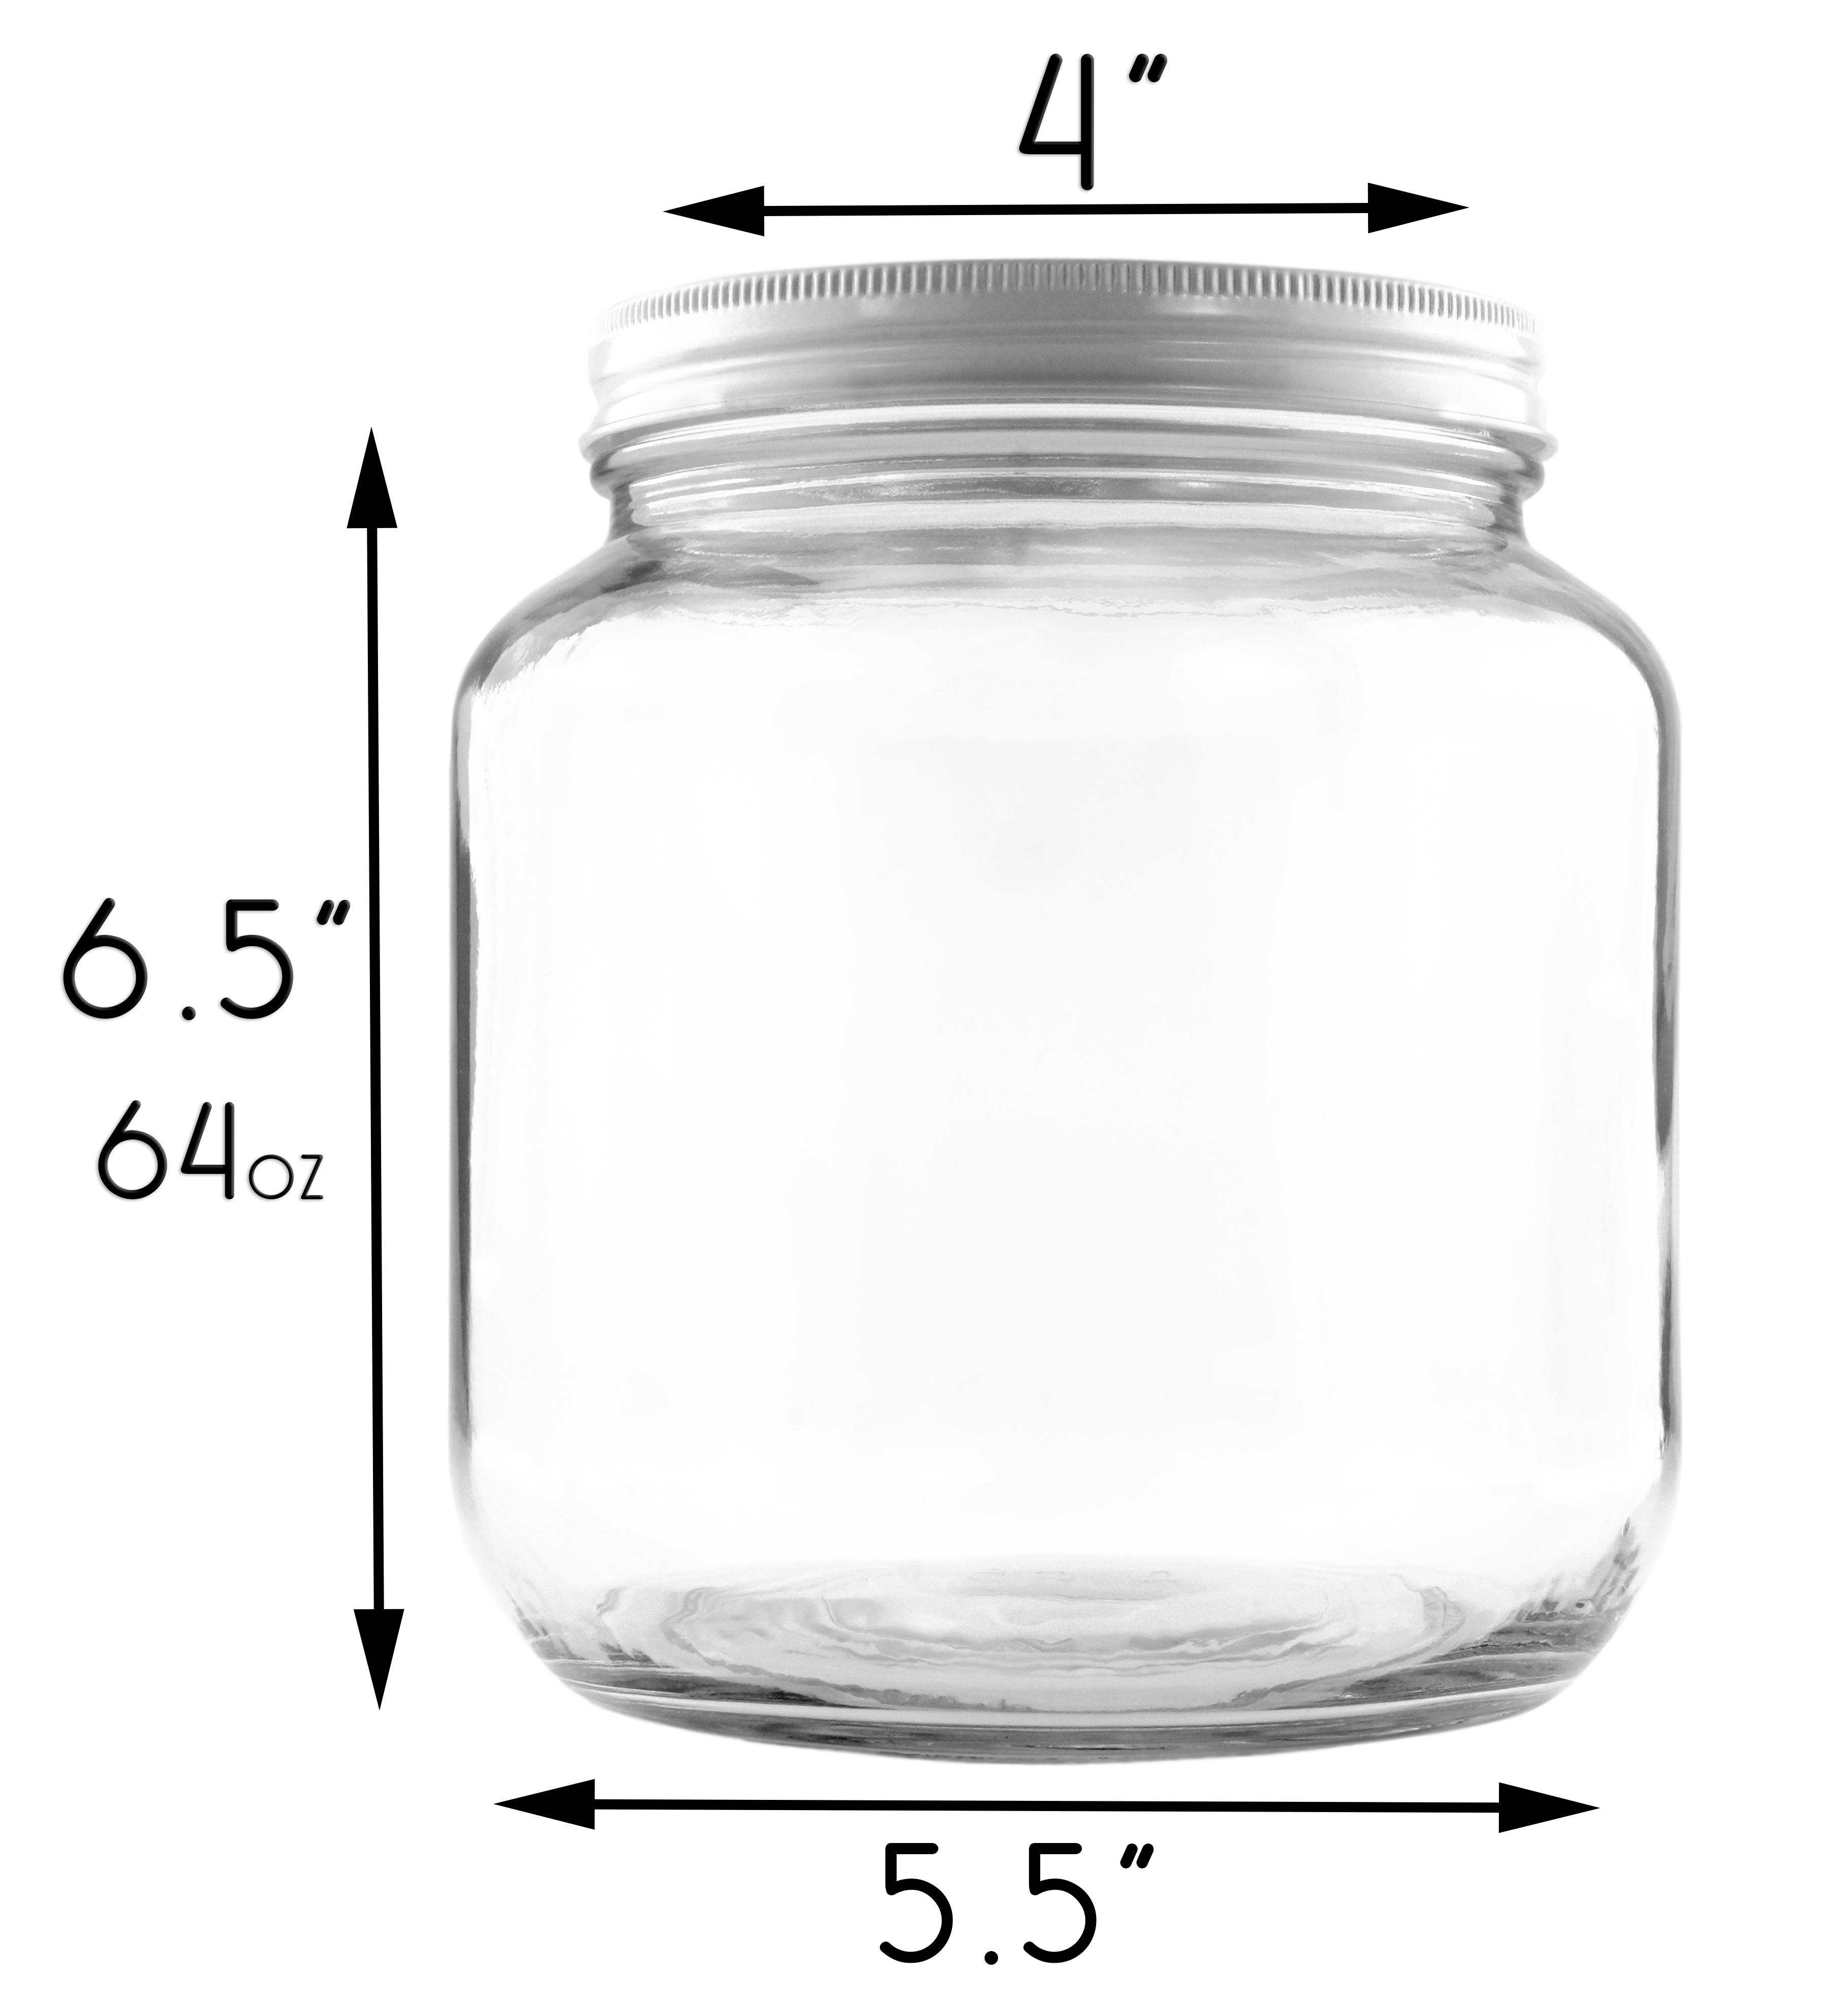 B01FMVSXHS - 64oz Clear Wide-mouth Glass Jar, BPA free Food Grade w White Metal Lid (Half Gallon) 3